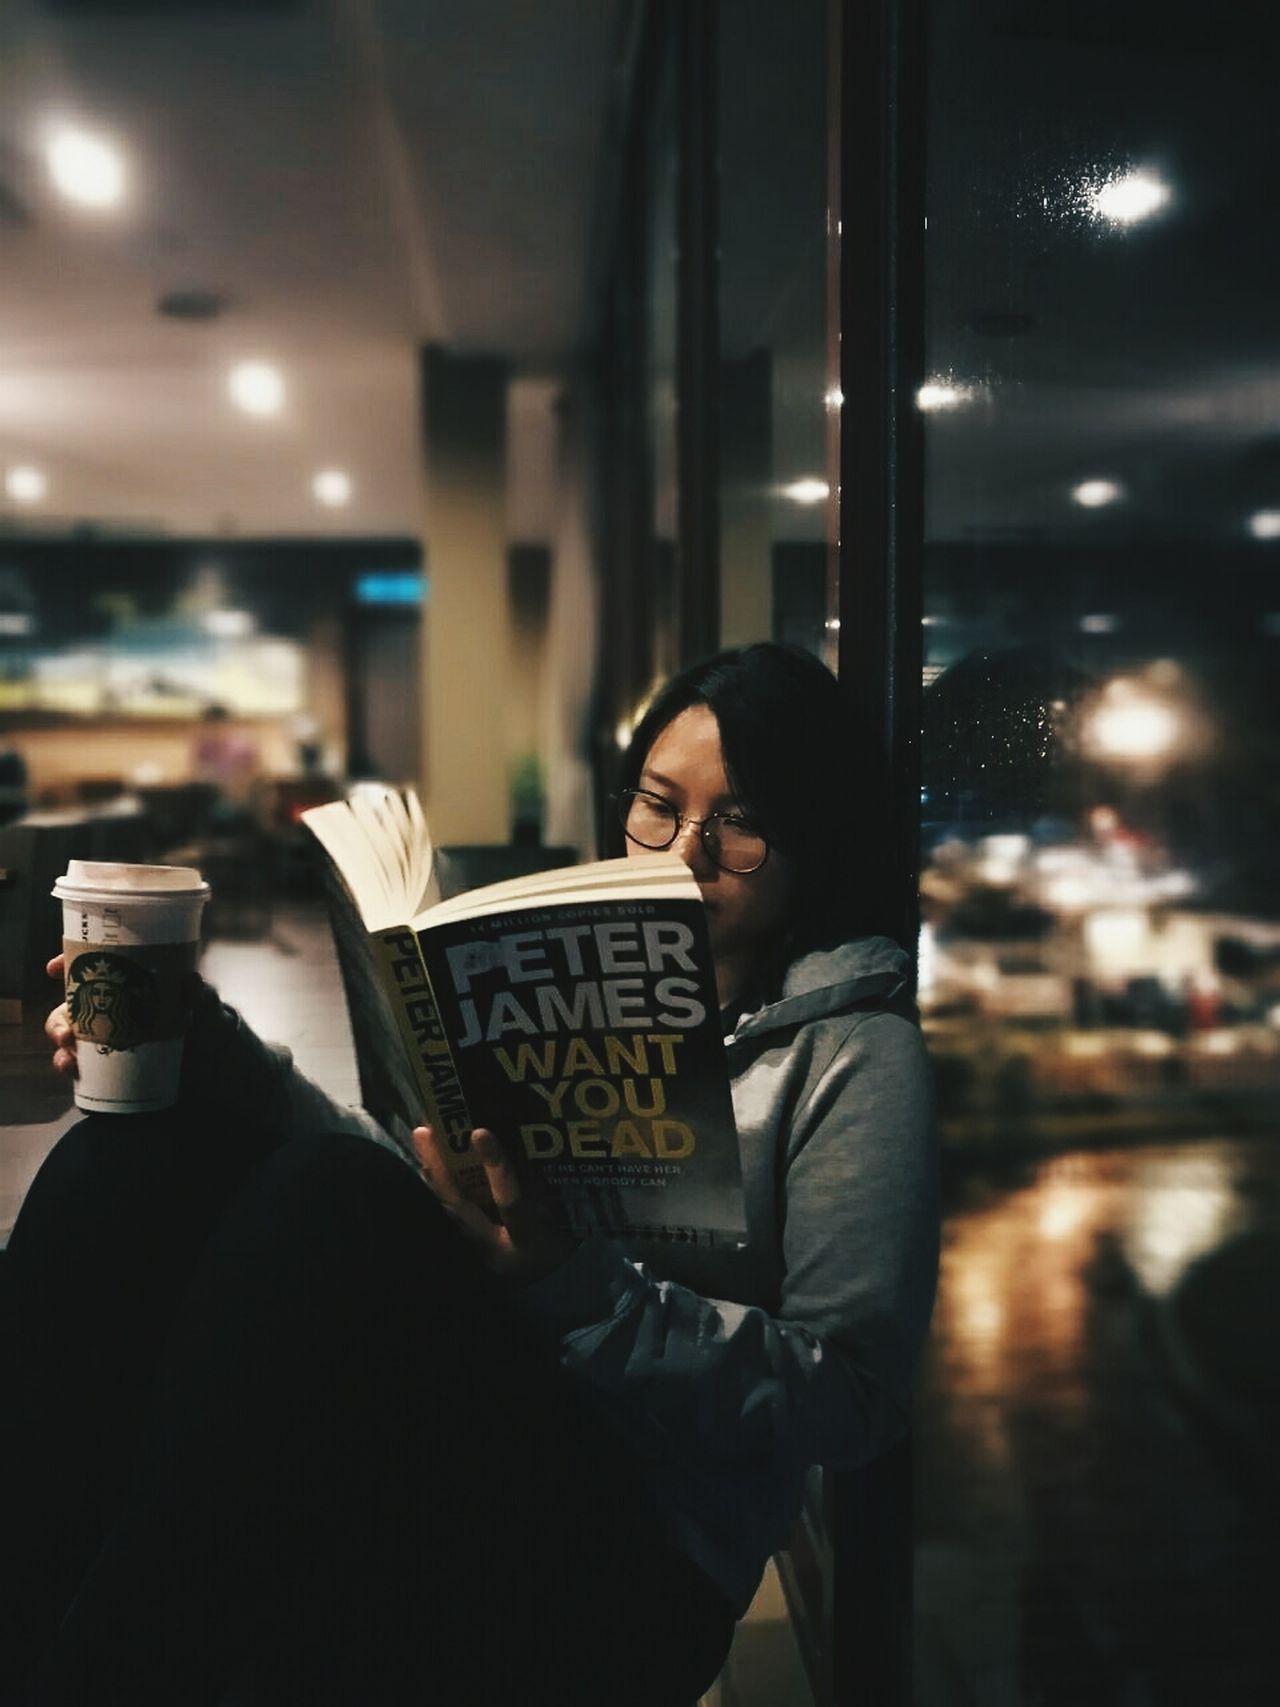 Book Books Coffee Coffee Cup Coffee Shop Coffeelover Coffee Time Rain Drops Rain Rainy Night Raindropshot RainyDay Raining Night Lights Night Photography Starbucks Starbucks Coffee Reading Reading A Book Reading & Relaxing Cozy Cozy Place Cozytime Cozy And Warm Uniqueness